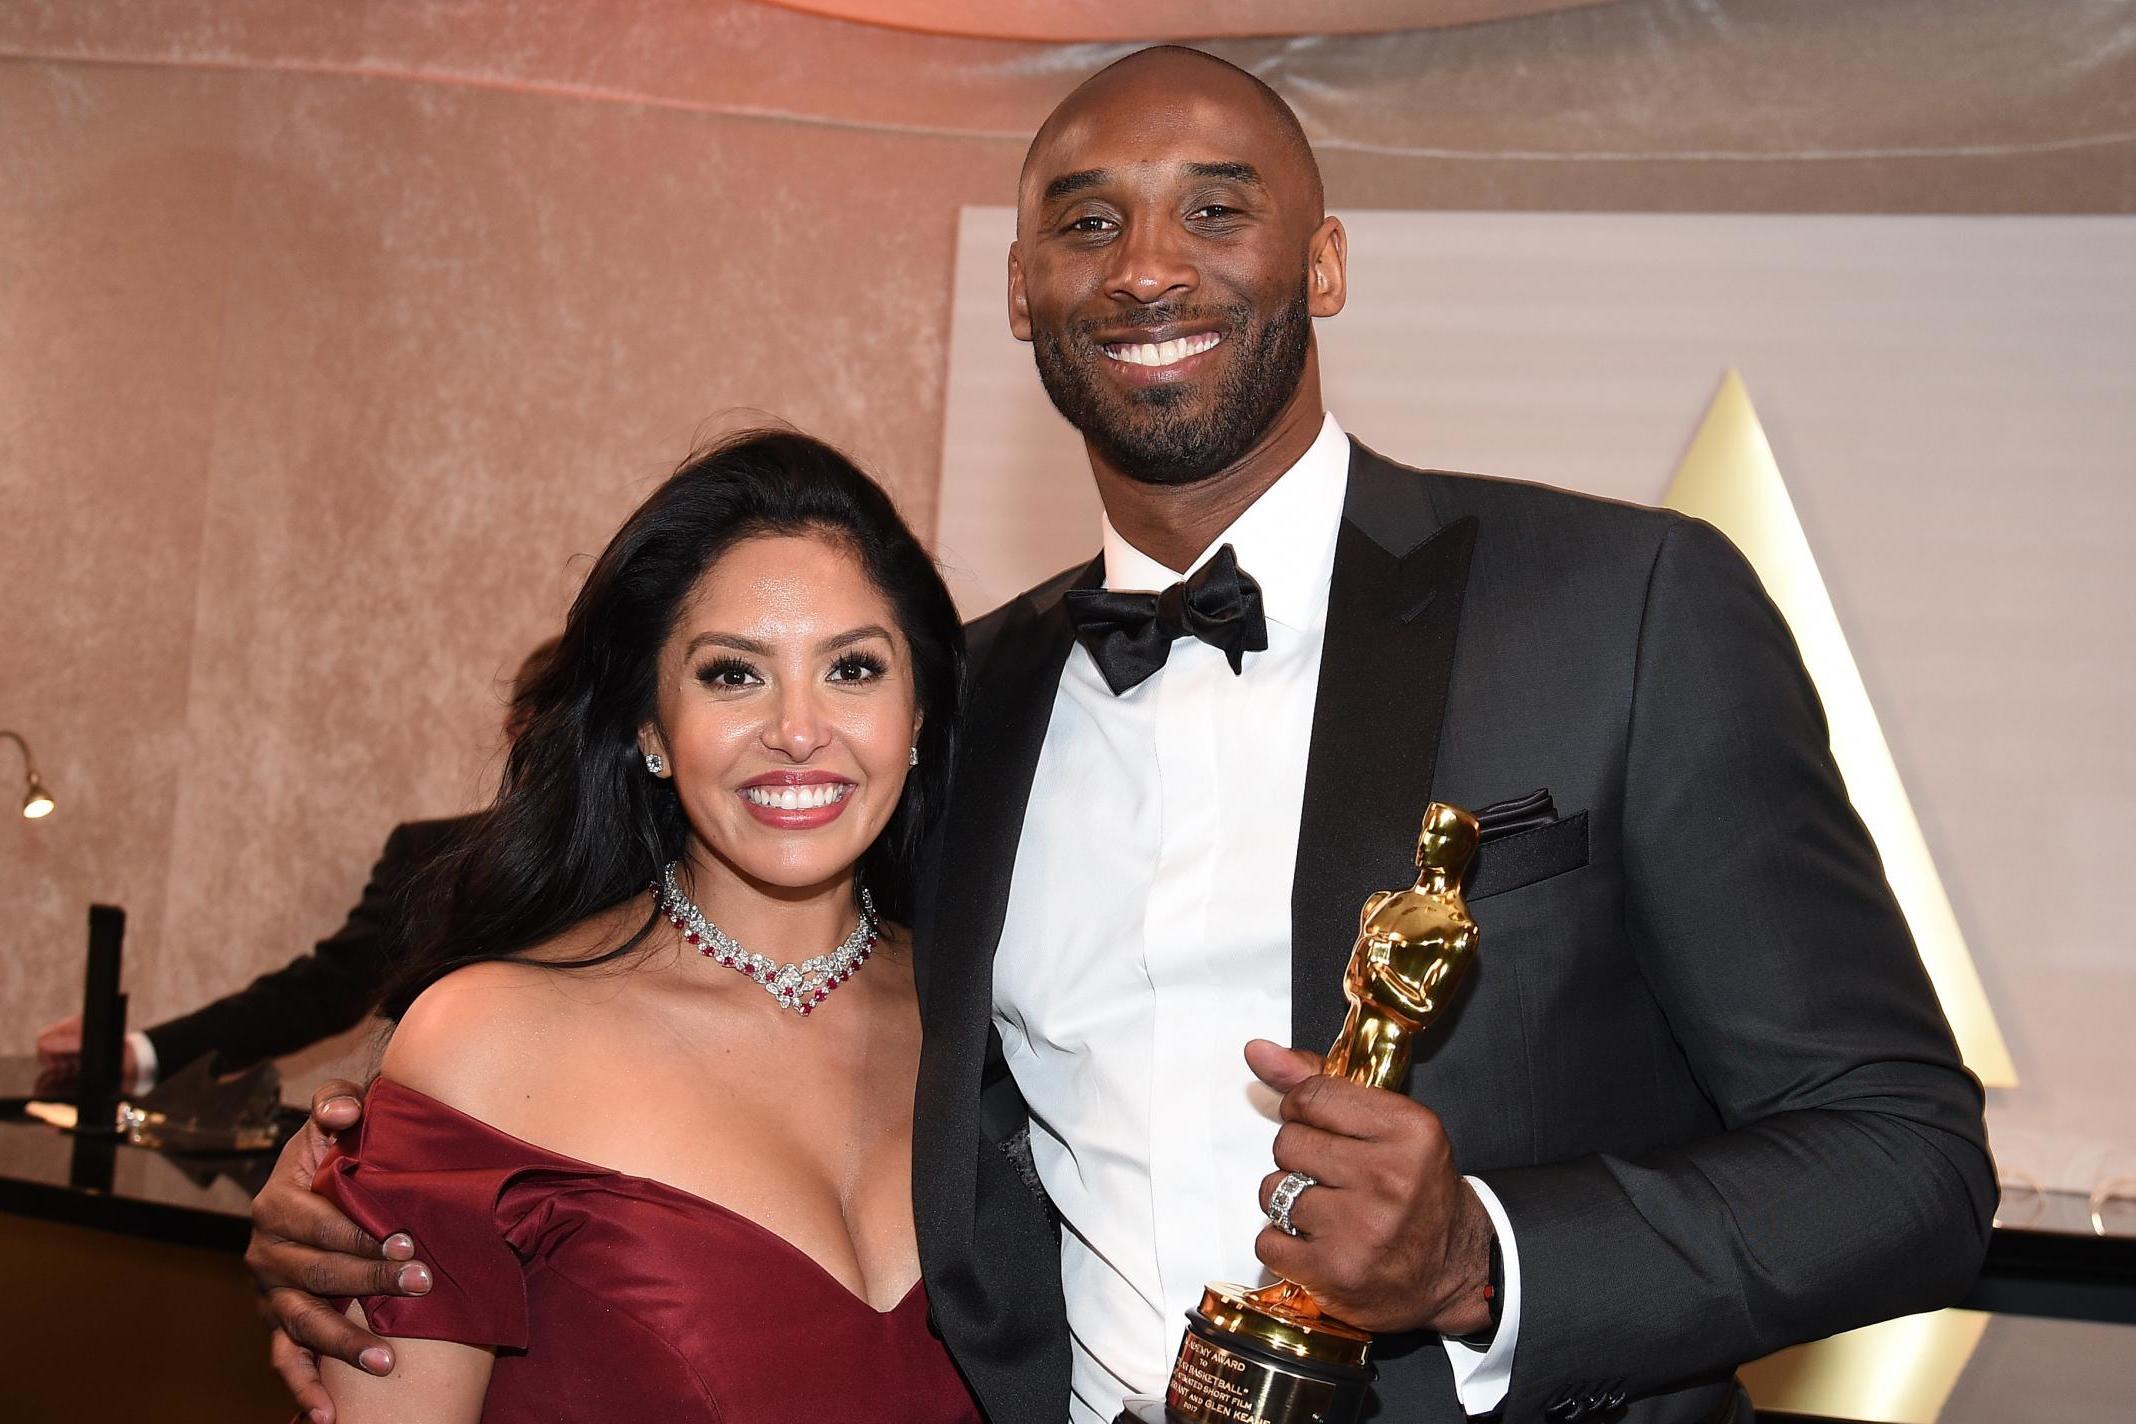 Vanessa Bryant shares heartfelt message to her 'forever Valentine' Kobe